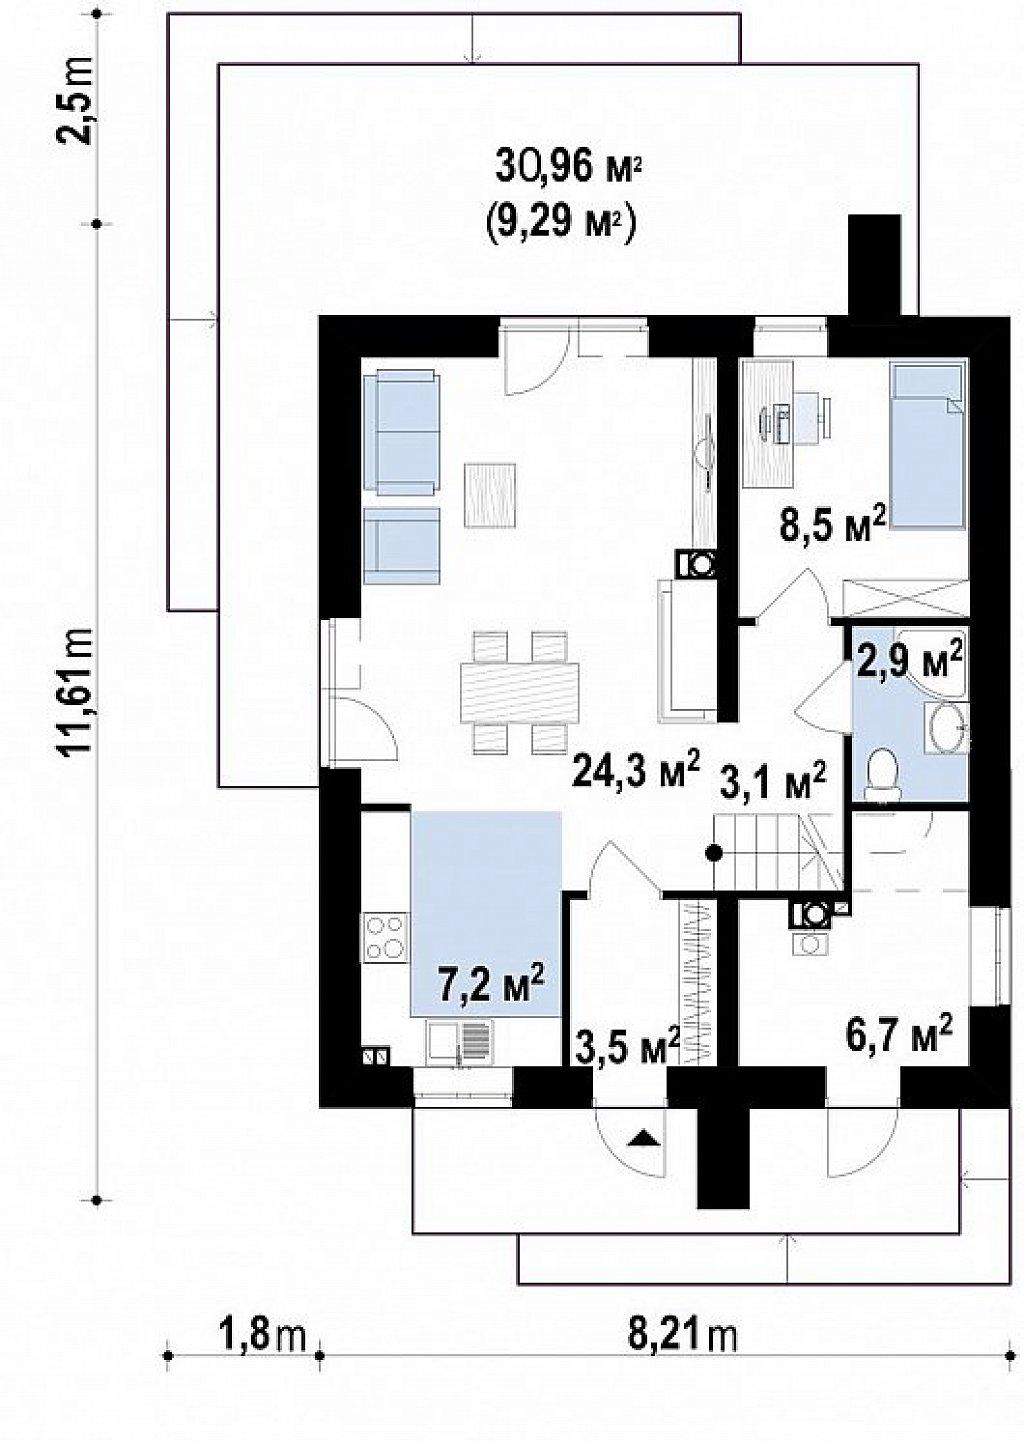 Первый этаж 69,5 м² дома z372 pk